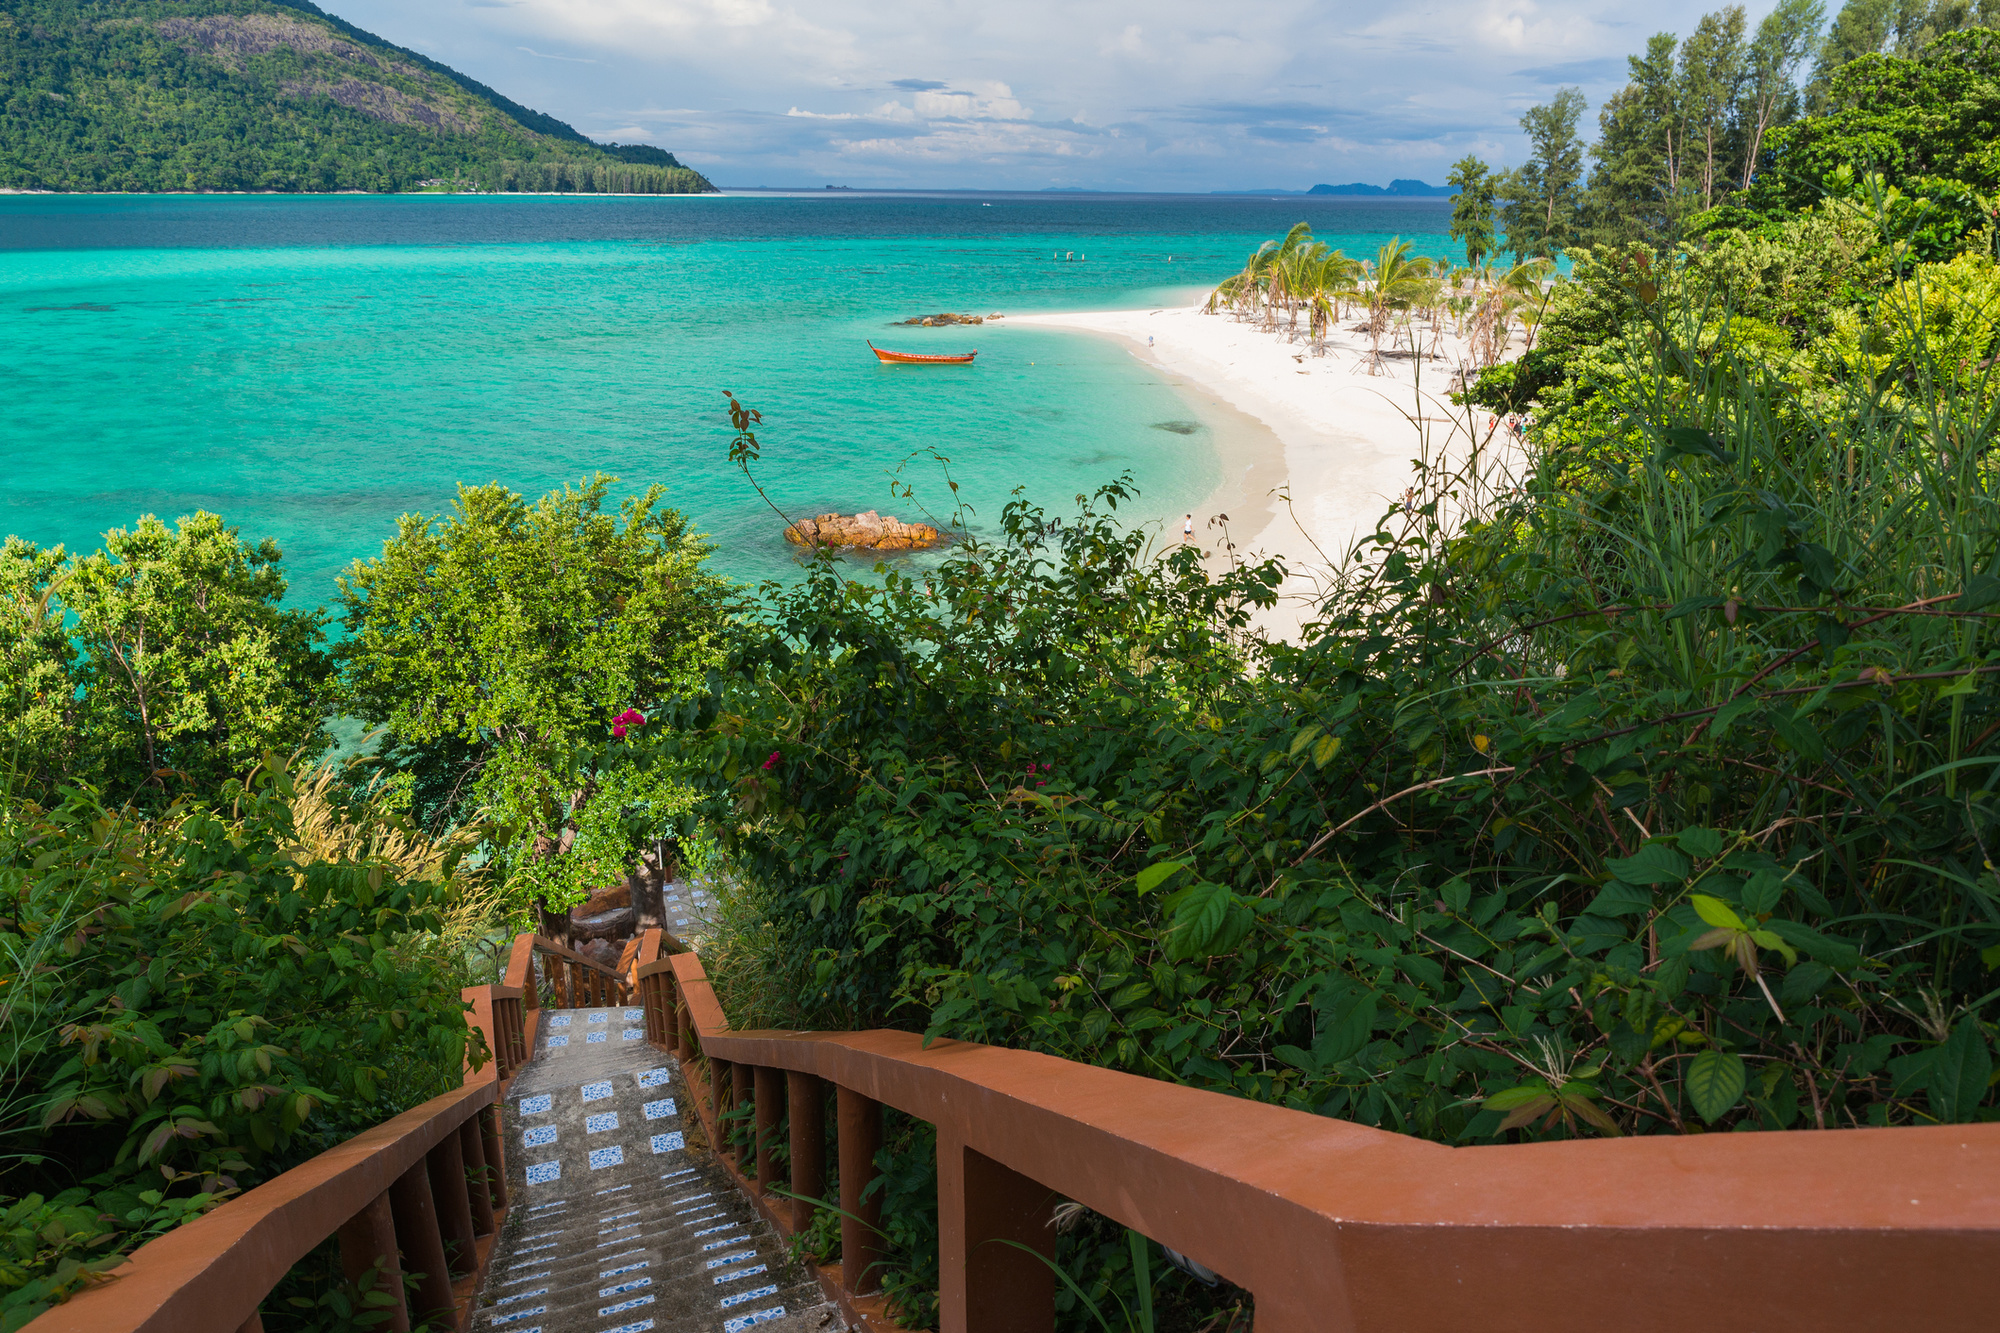 Koh Lipe-beach, iStock